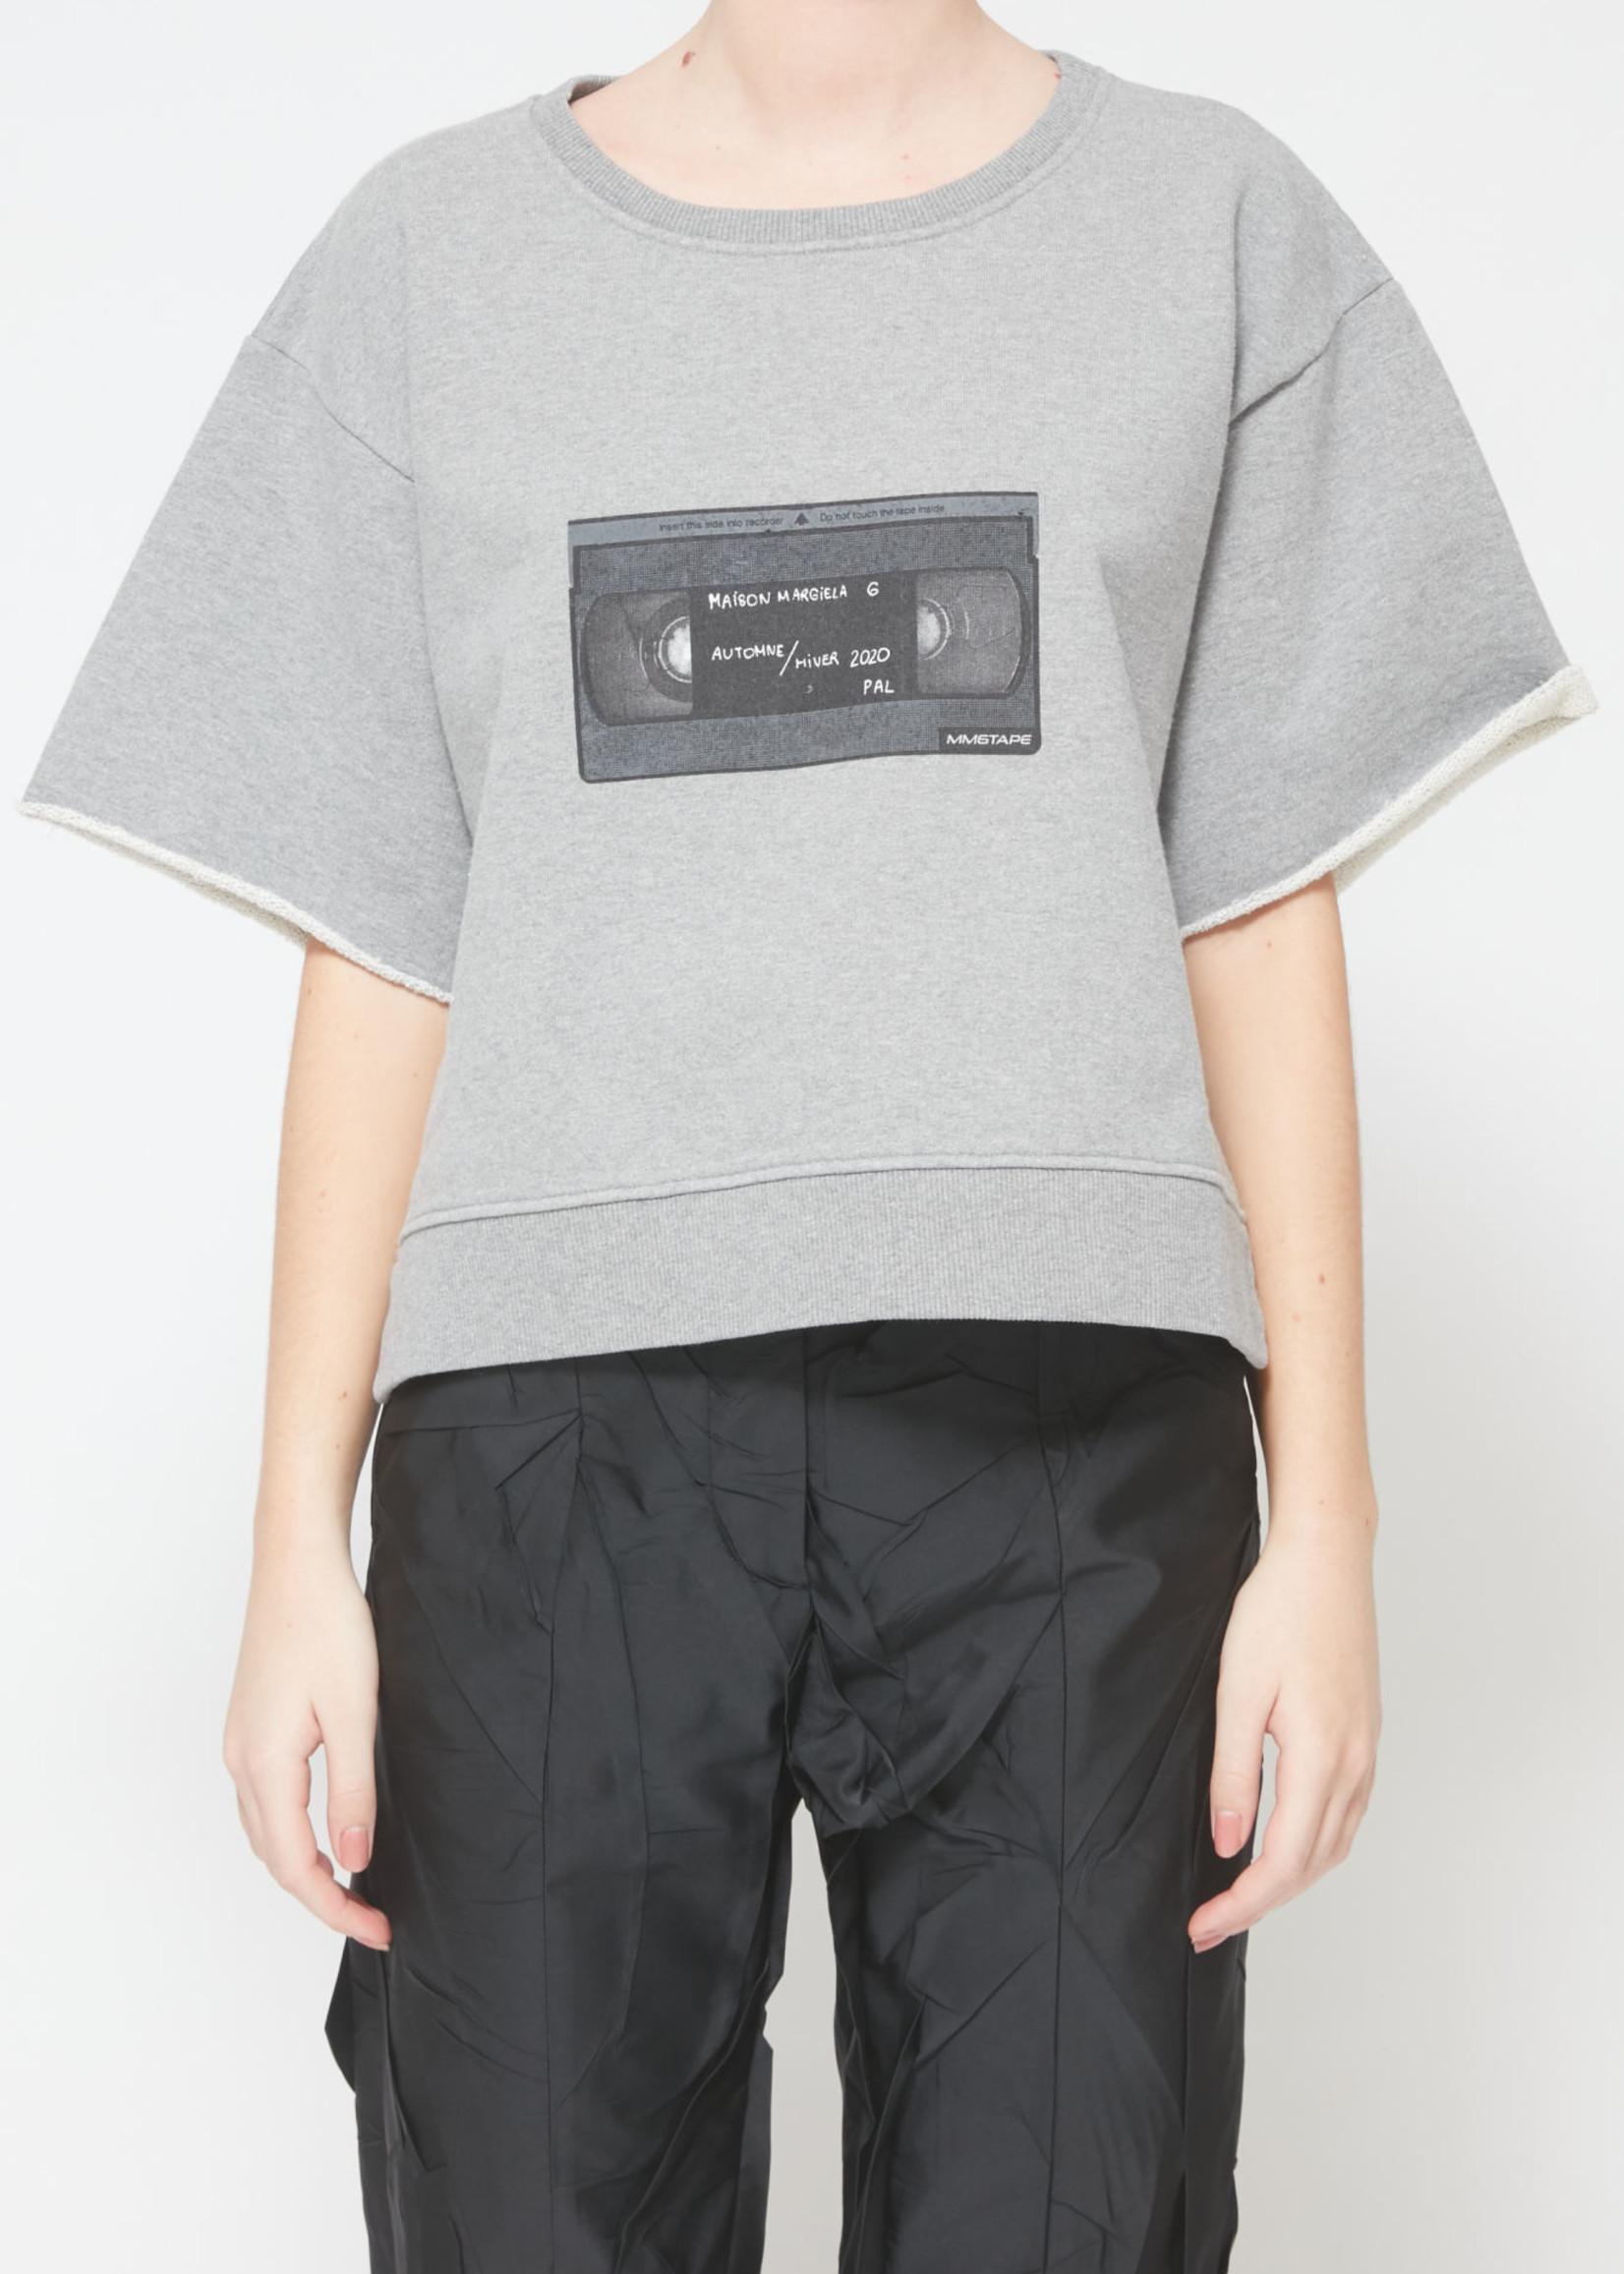 MM6 MAISON MARGIELA VHS Sweatshirt in Heather Grey